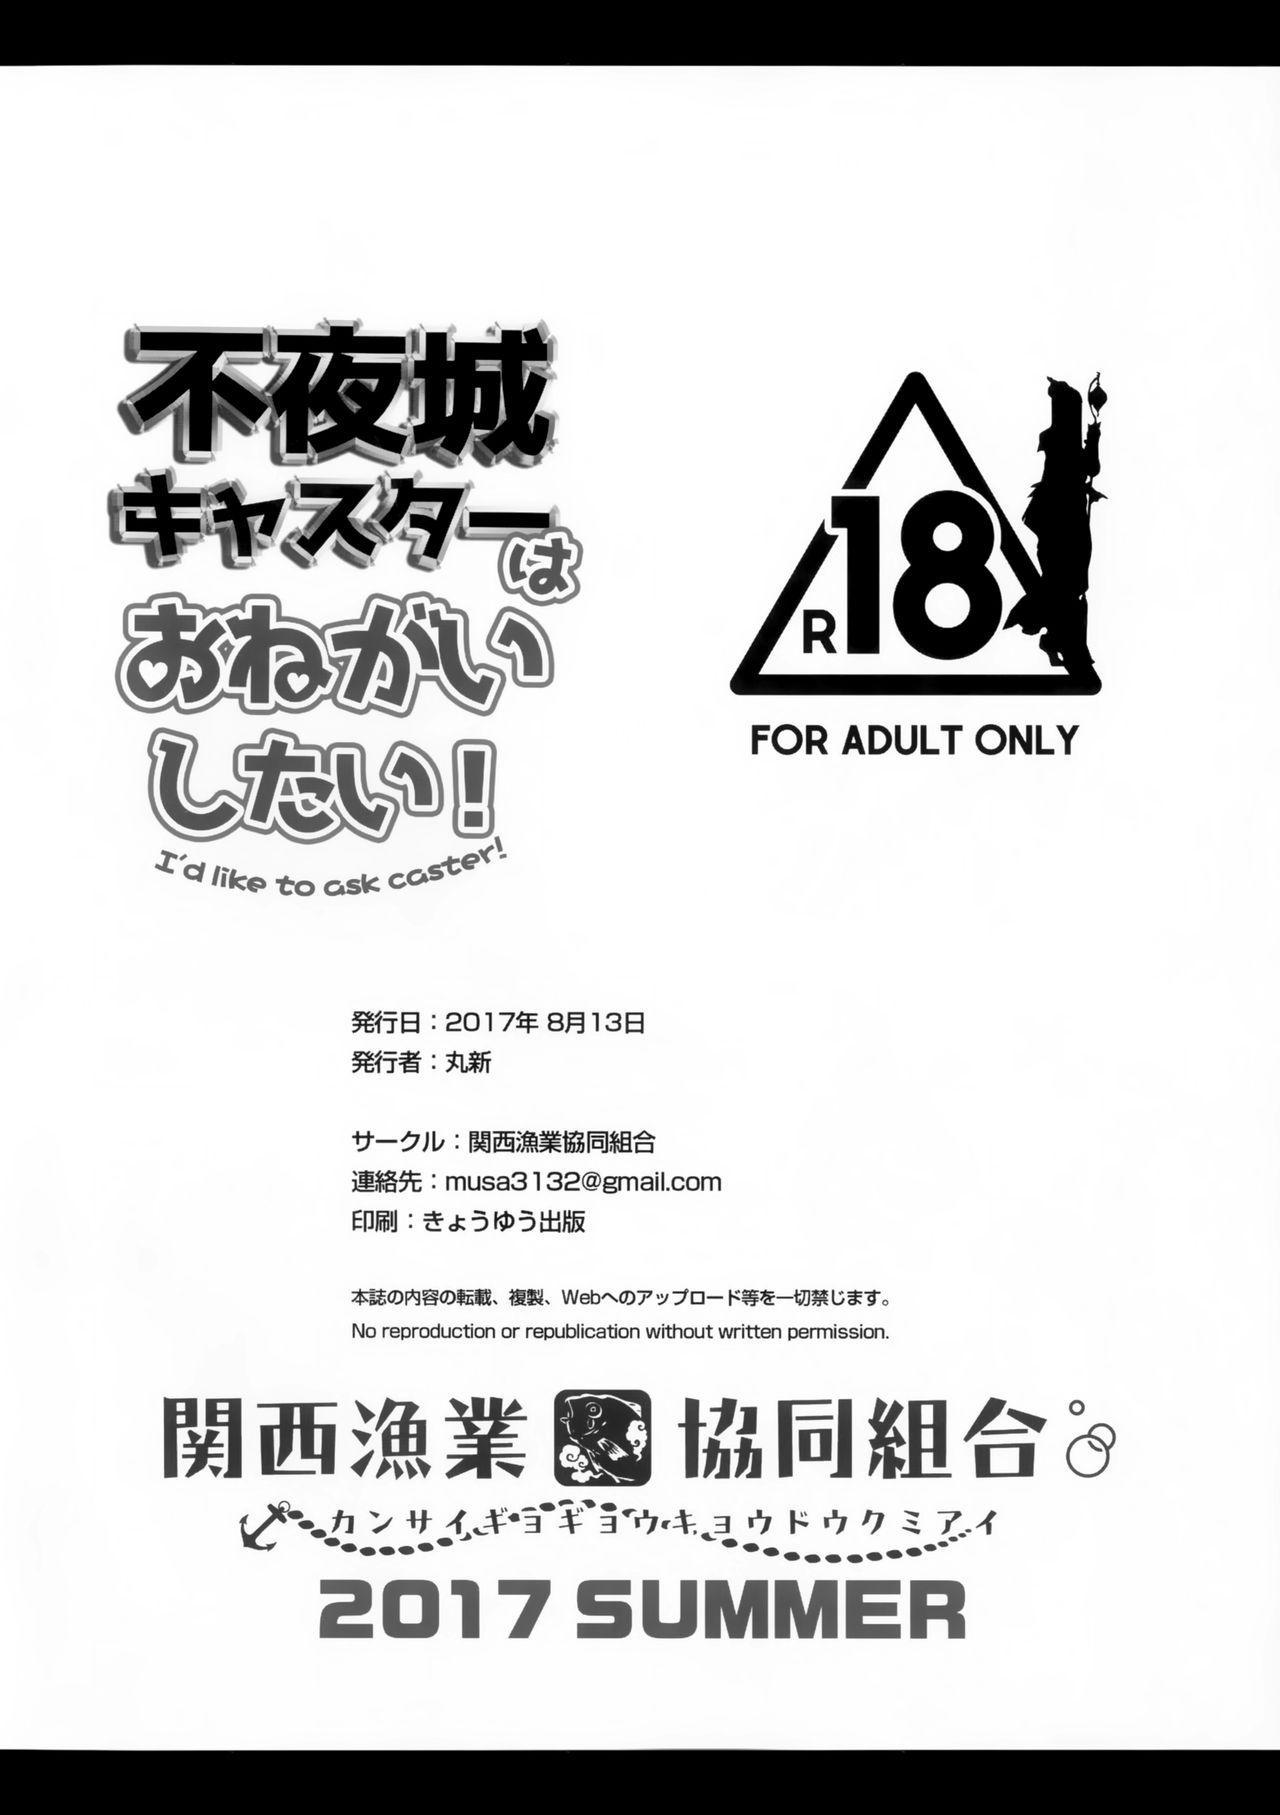 Fuyajou Caster wa Onegai Shitai! - I'd like to ask caster! 7